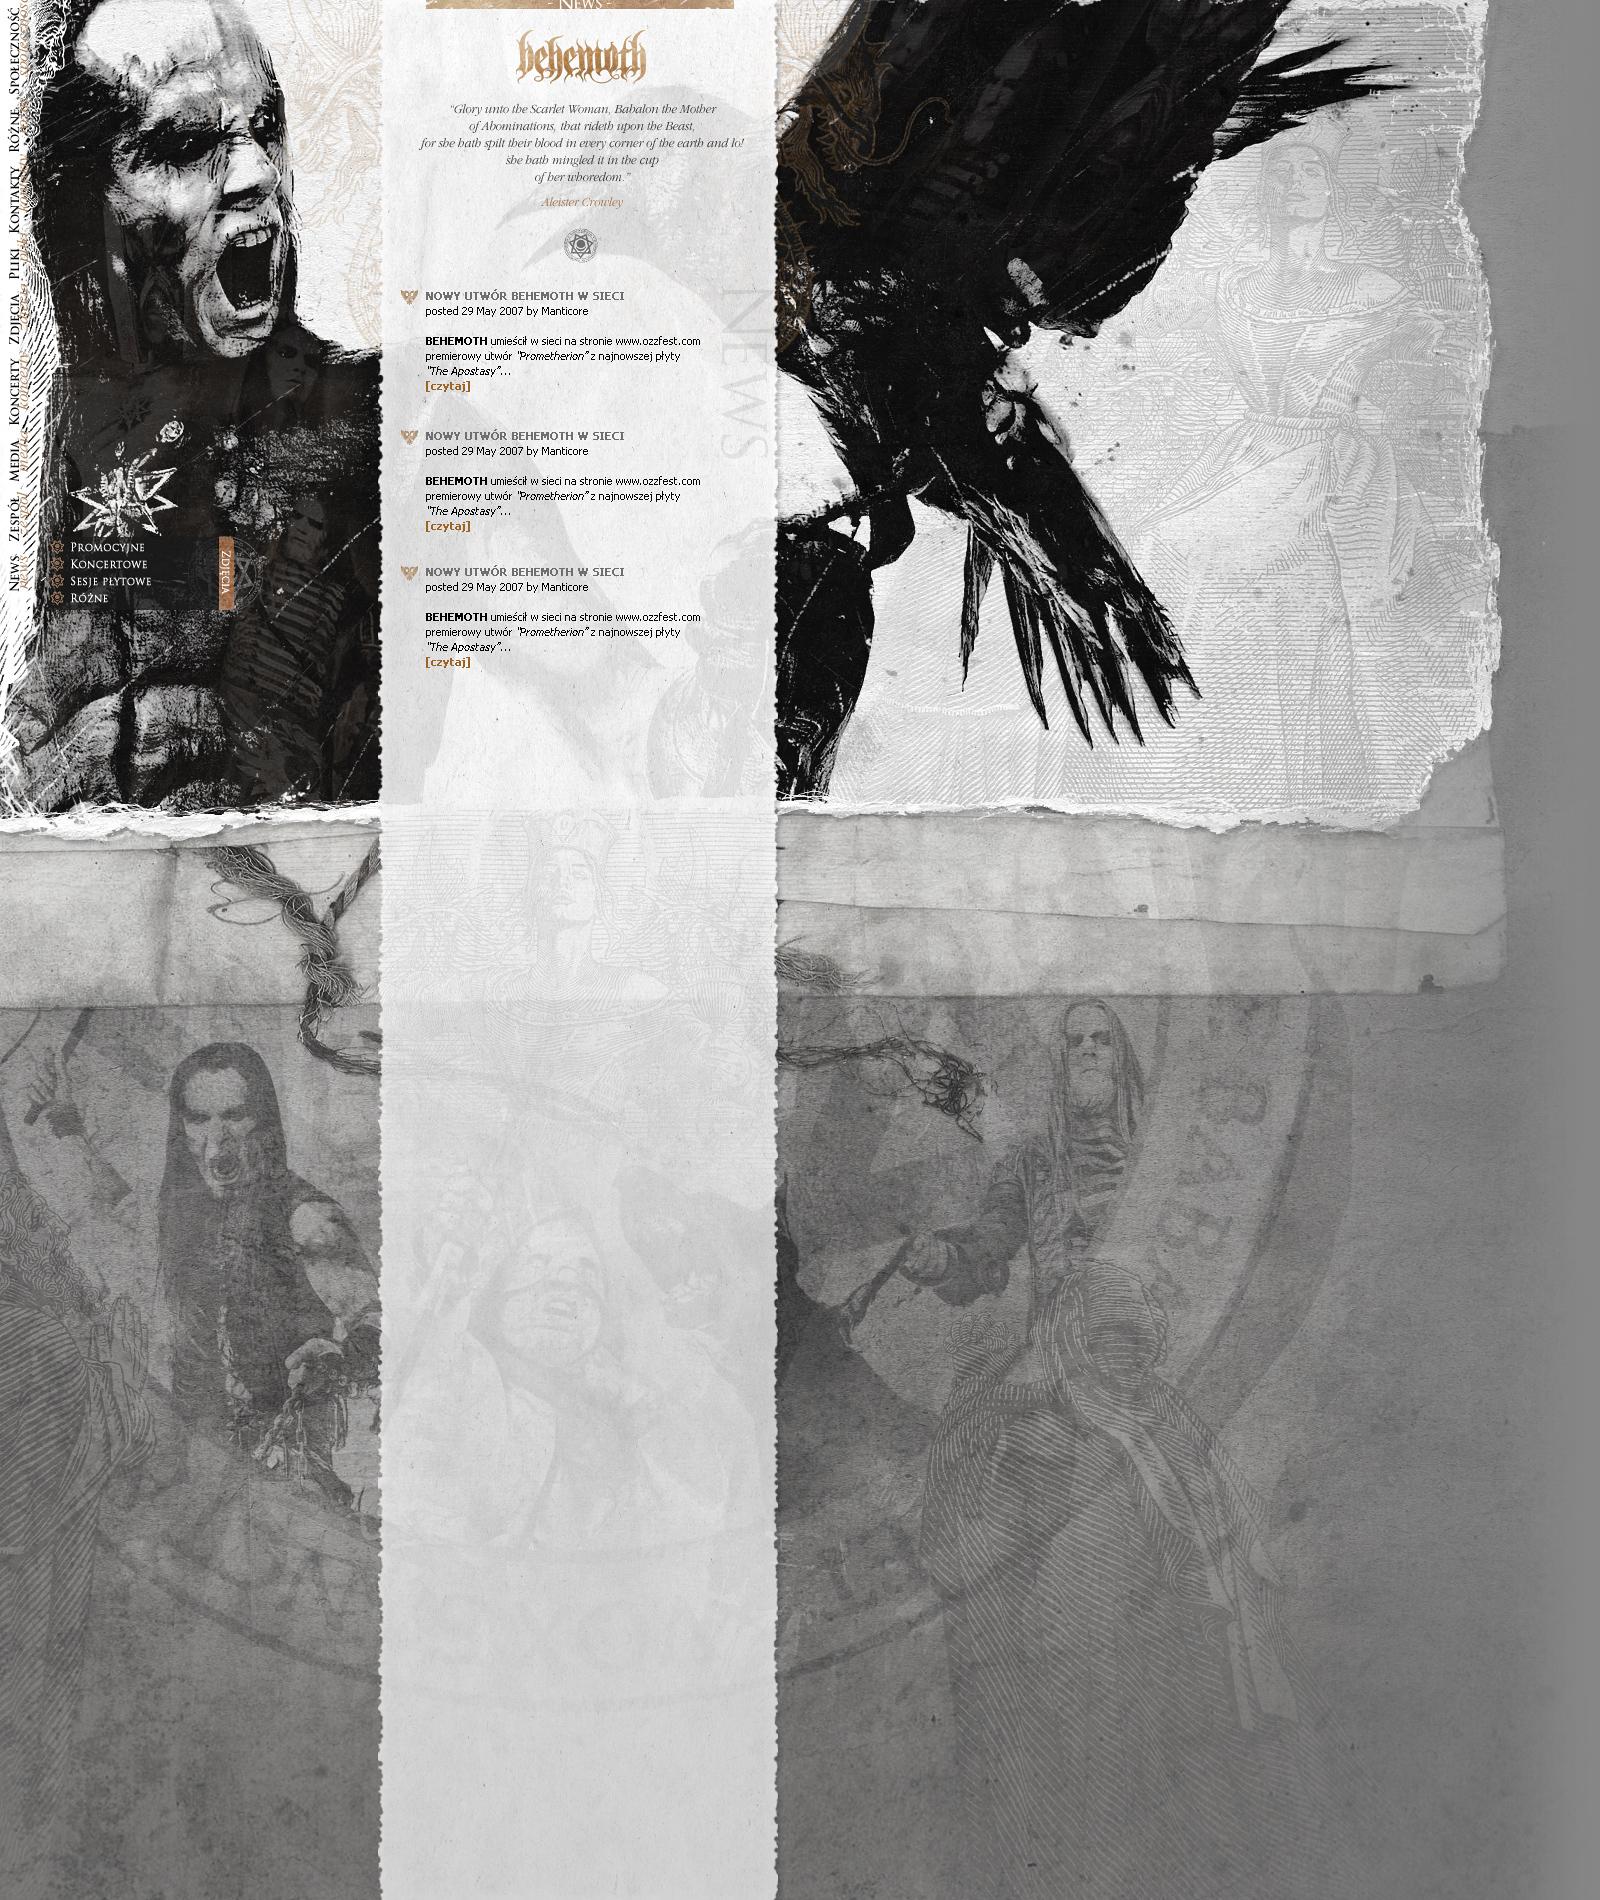 Behemoth - edycja Evangelion (2009)